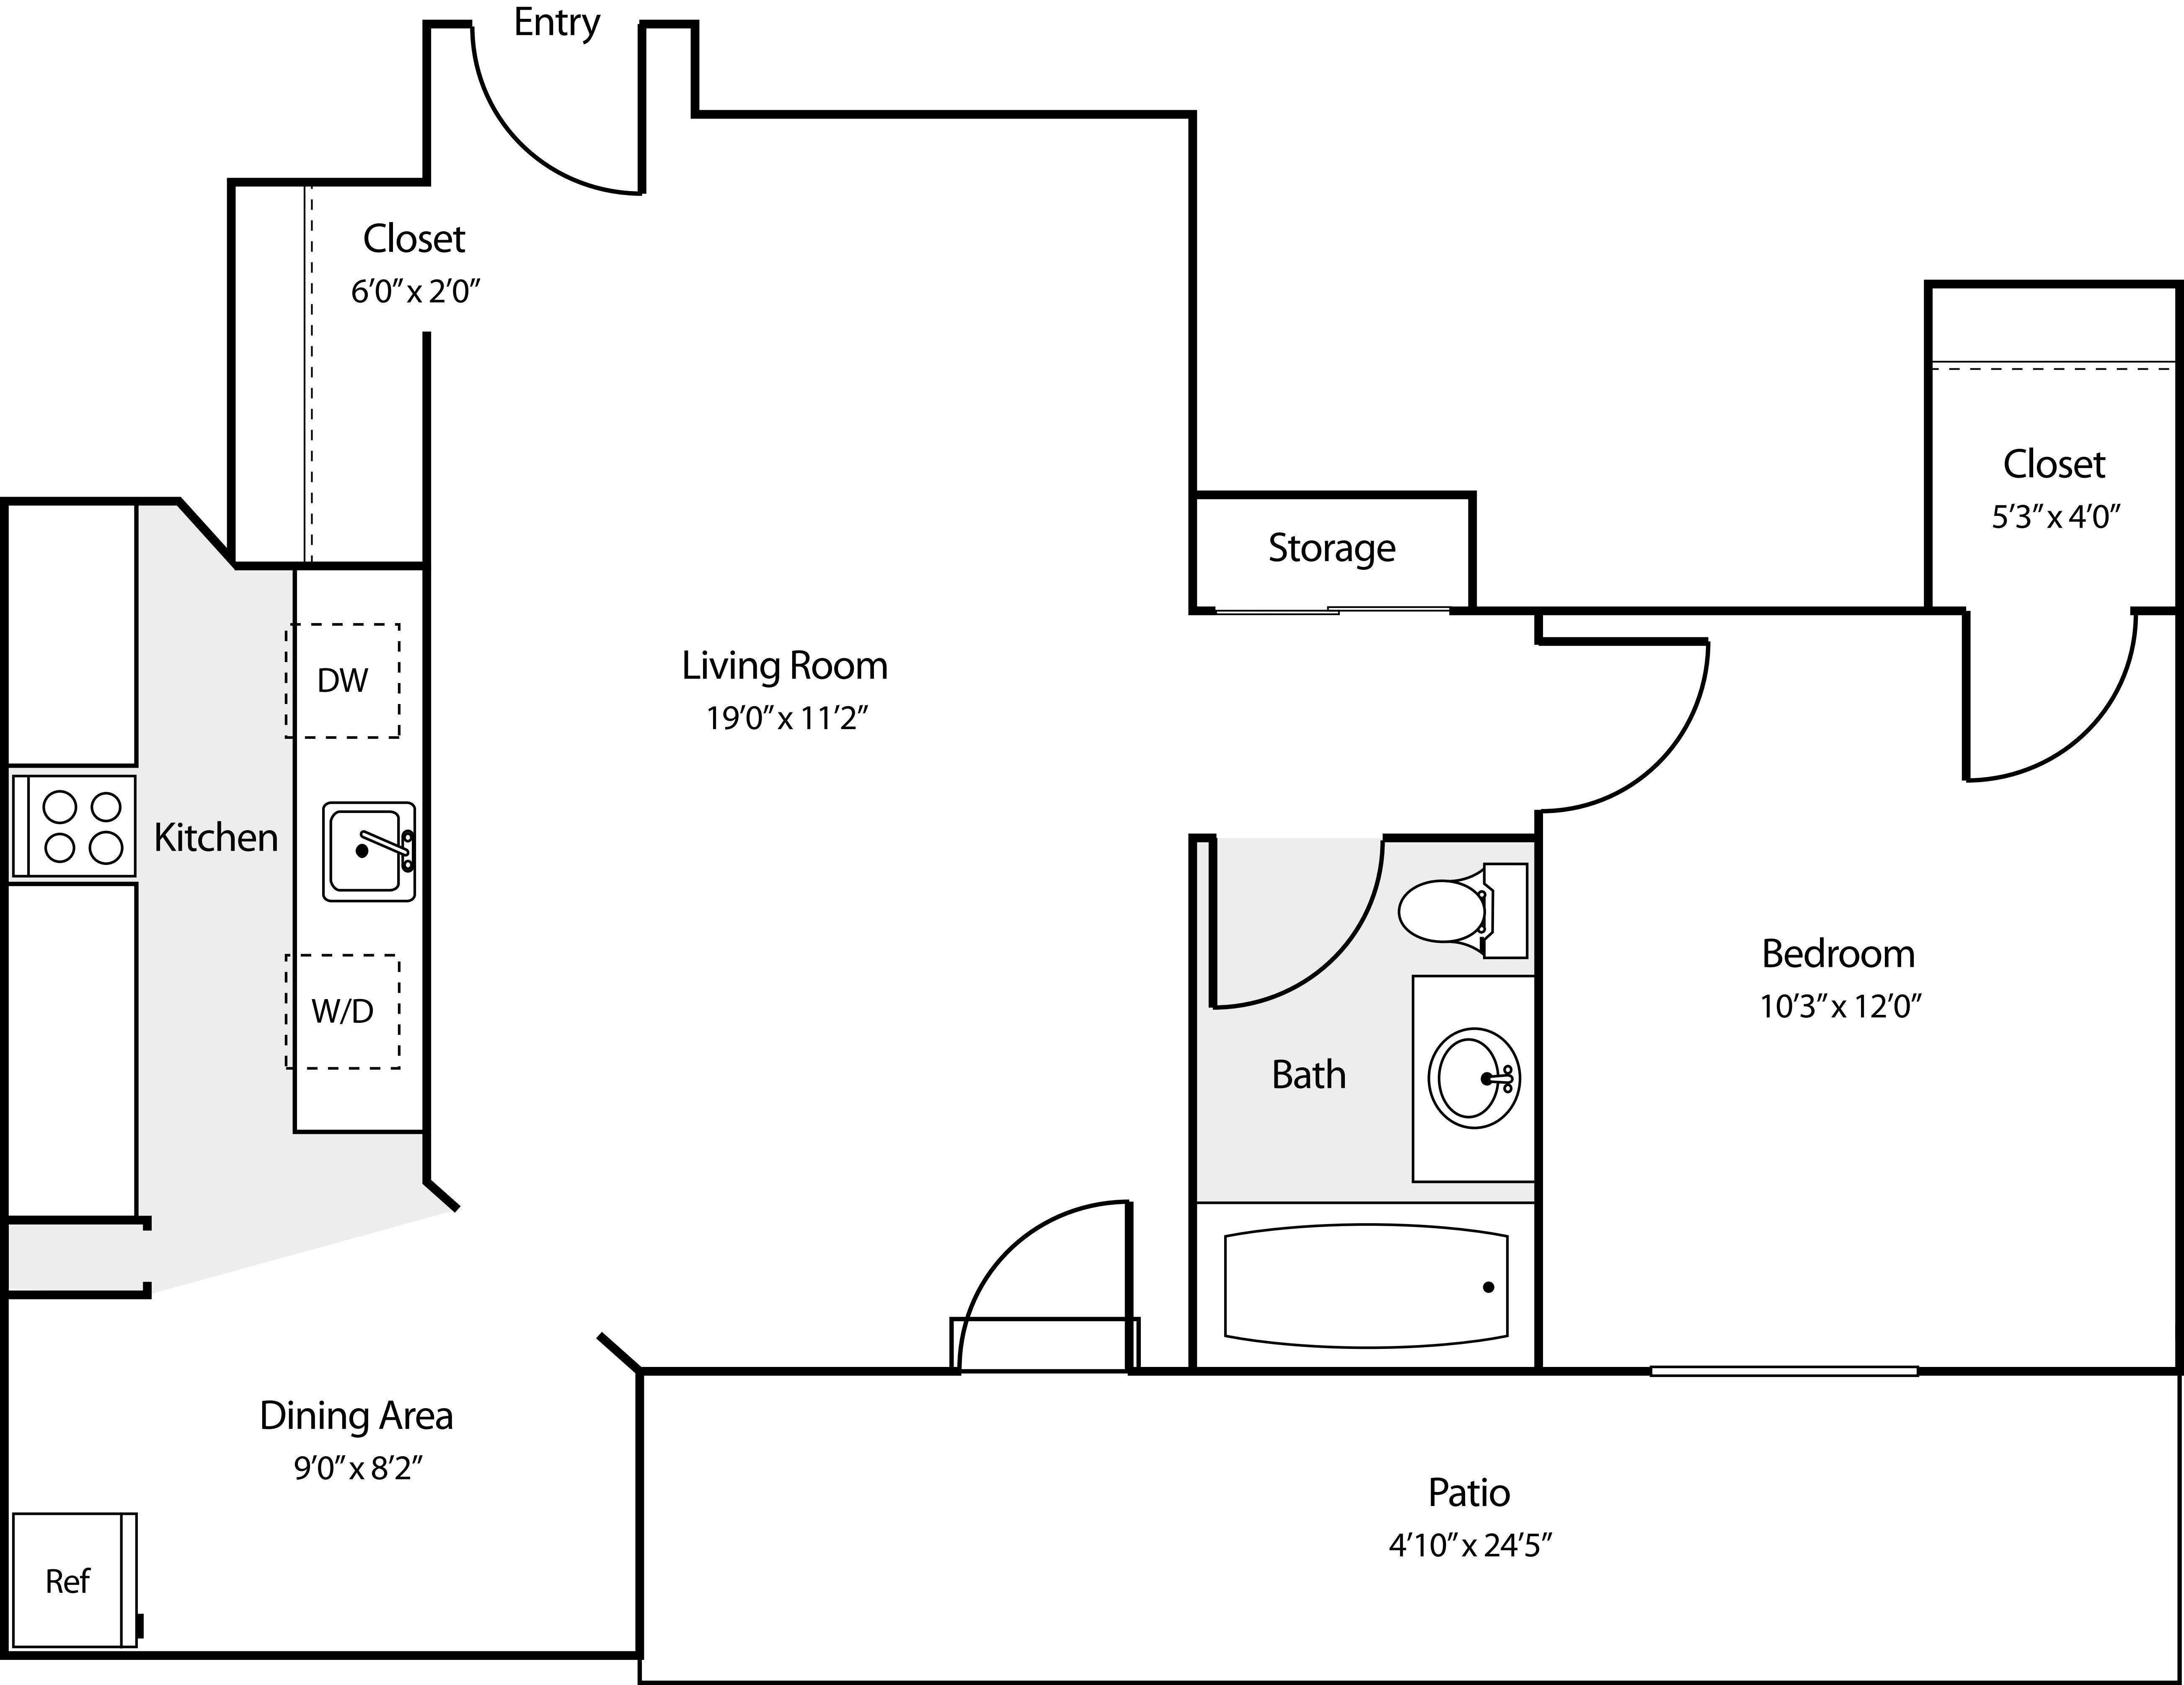 1 Bedroom CC